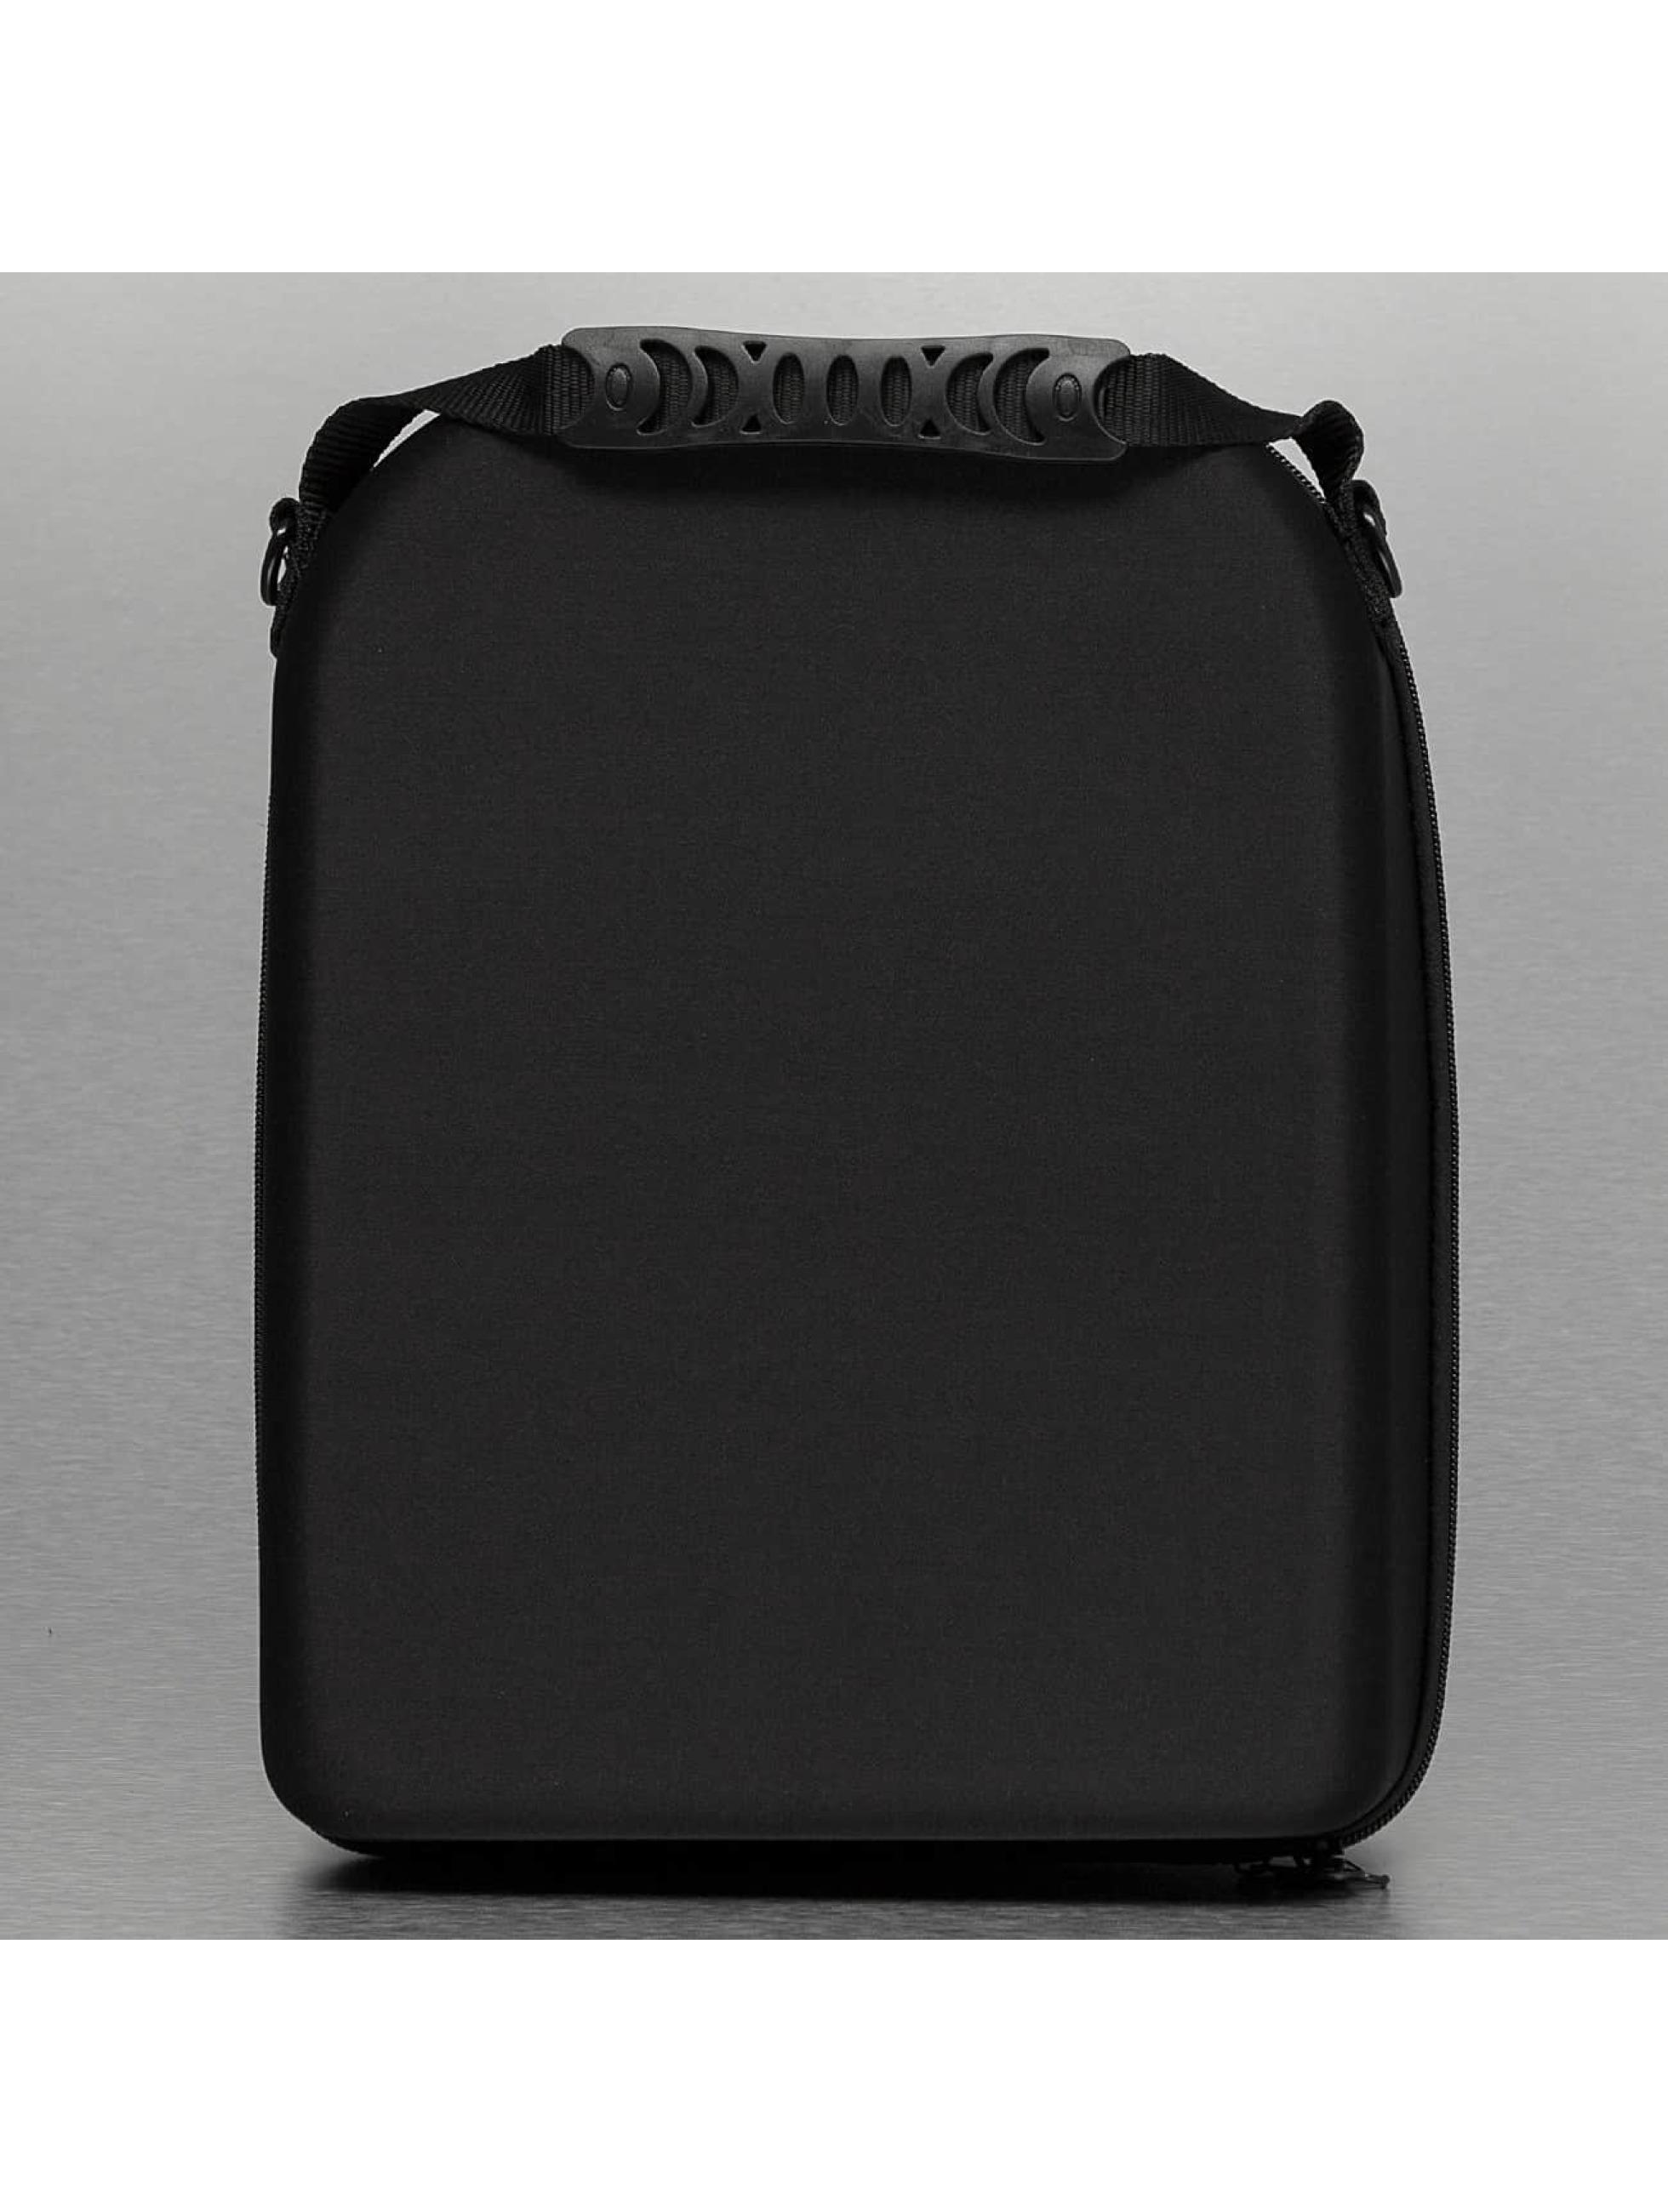 Cap Crony Overige 6K Carrier Travel Box zwart